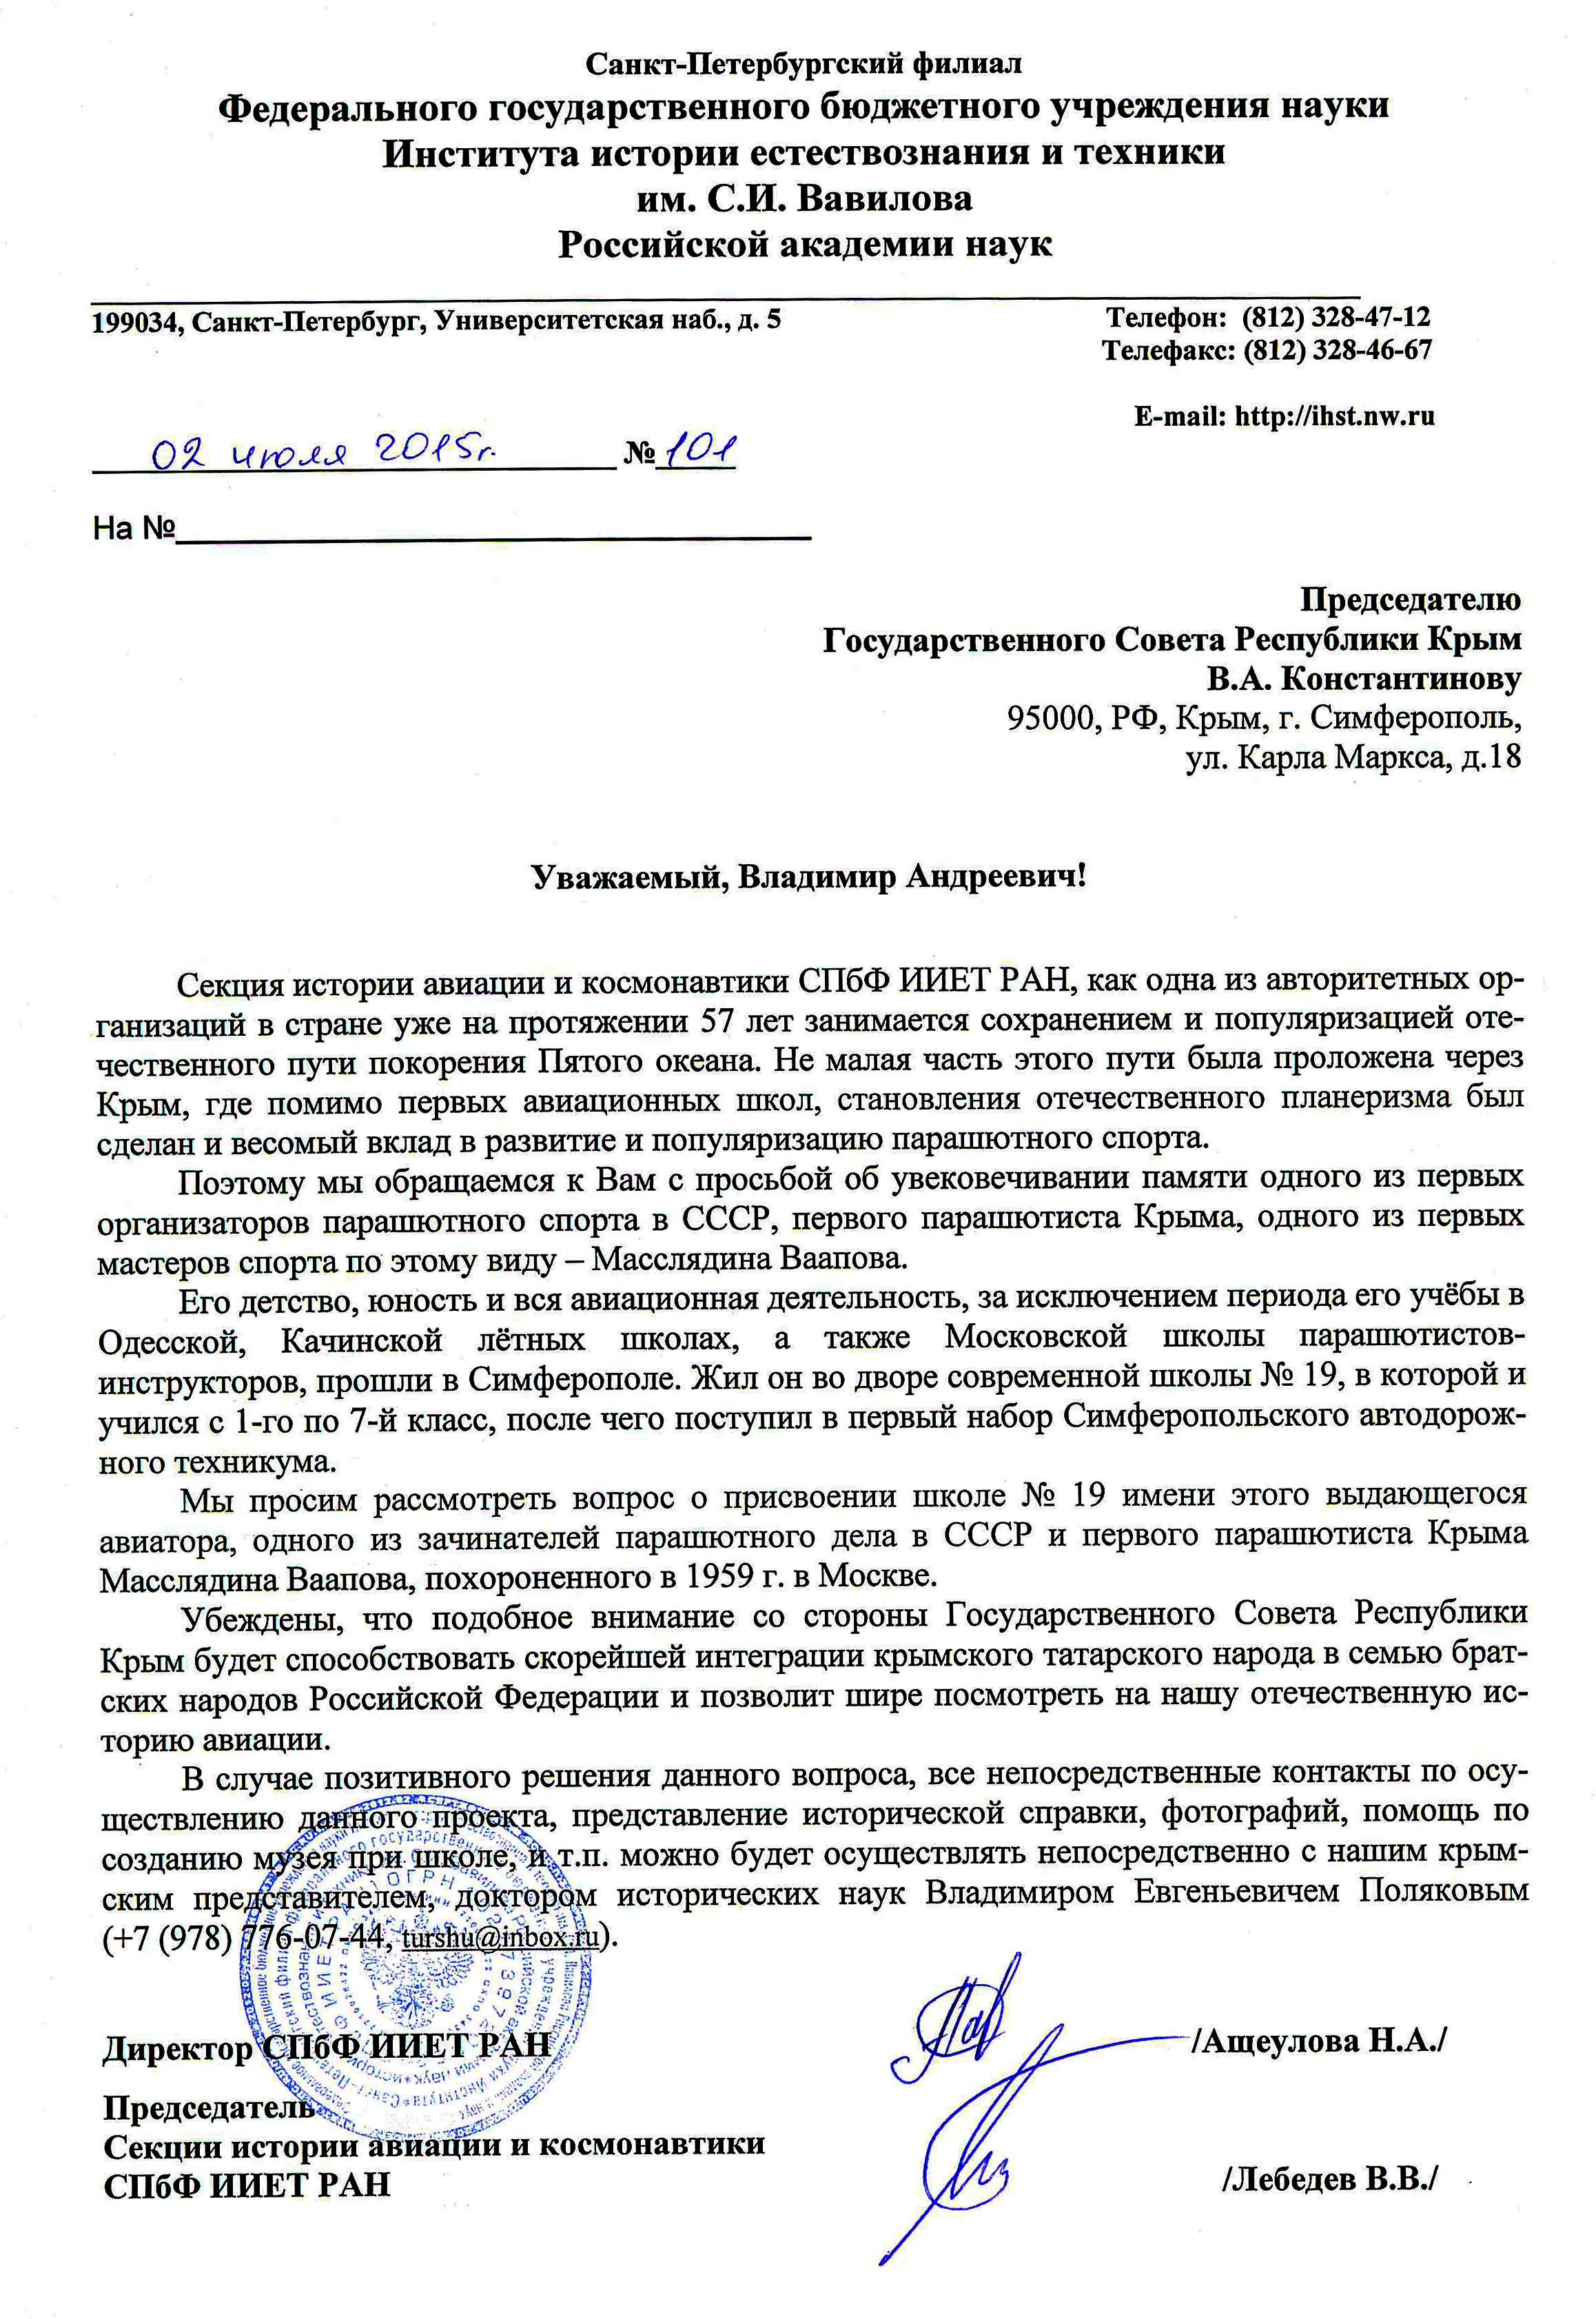 02072015-konstantinov-crimea